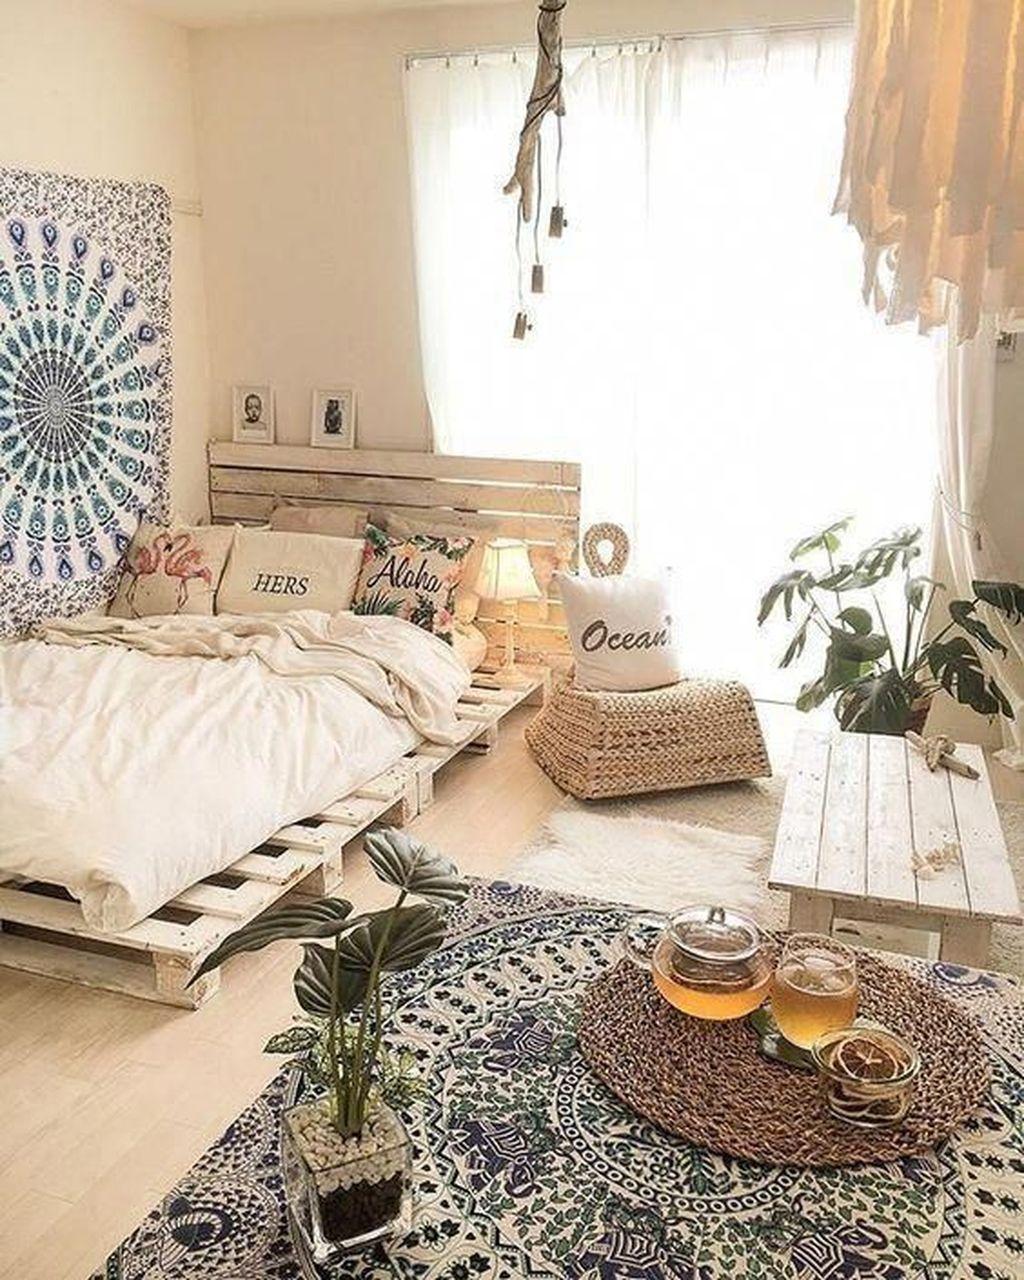 Awesome Boho Chic Bedroom Decor Ideas 04